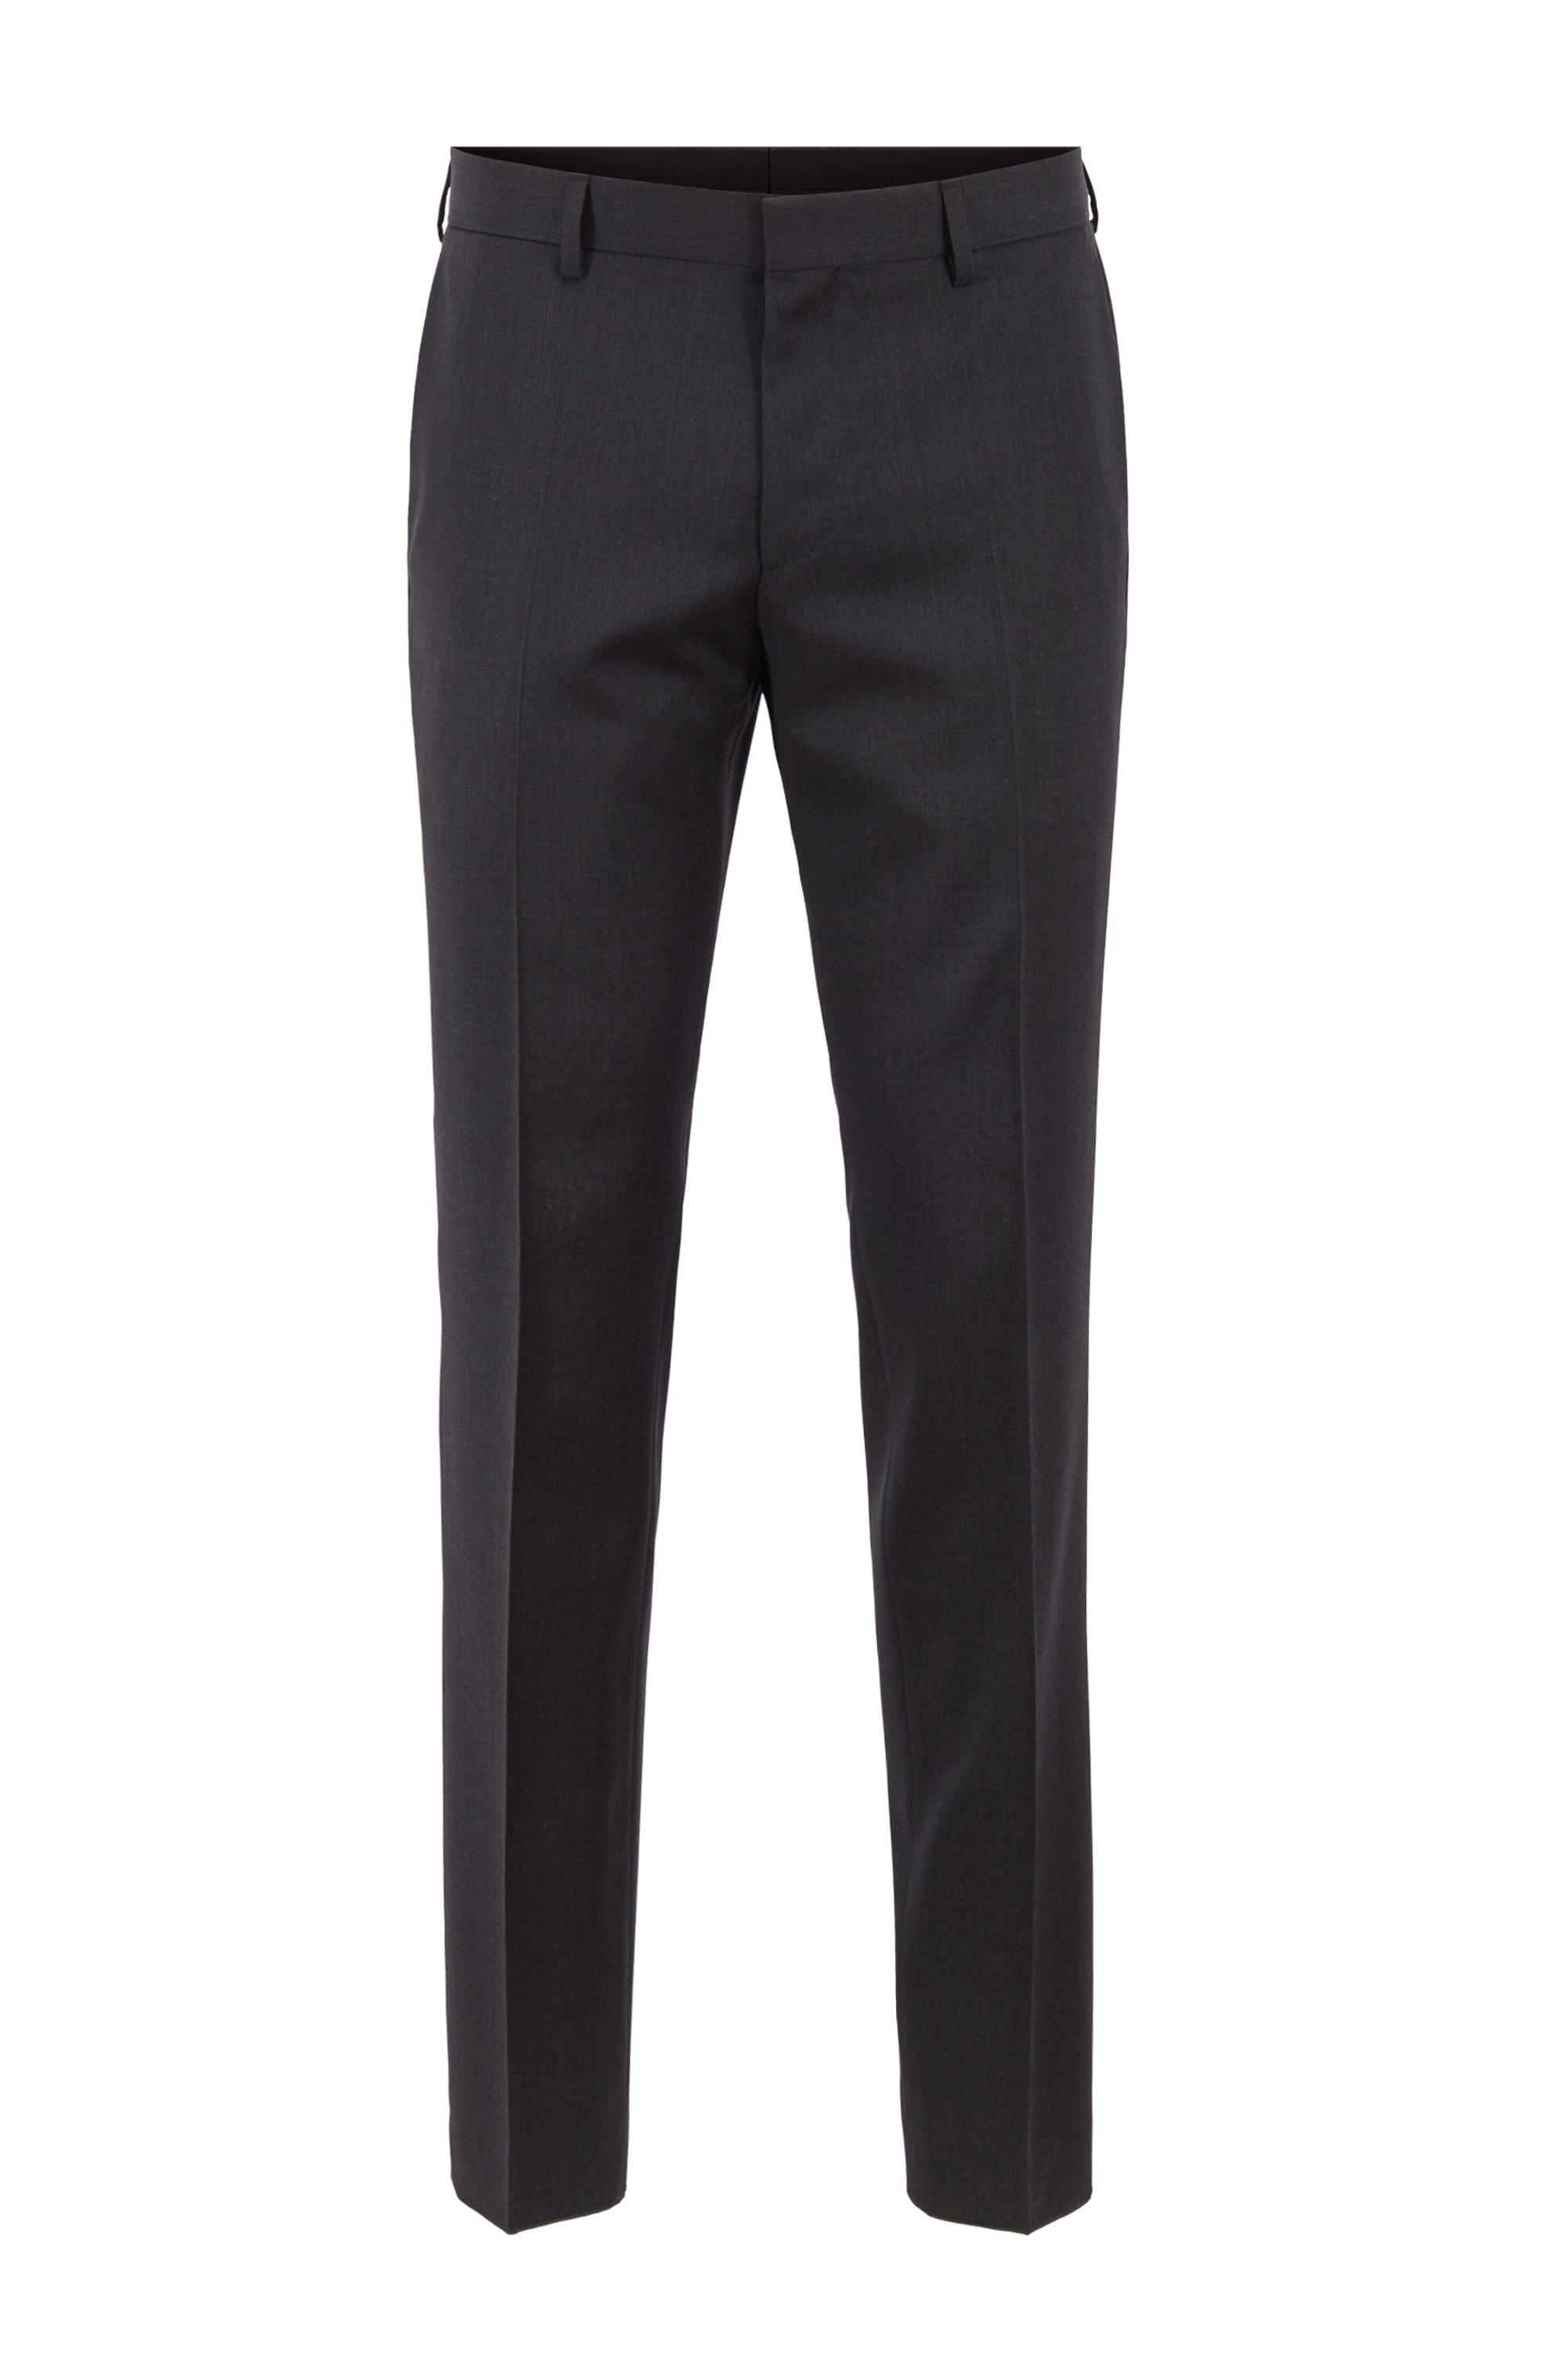 Pantaloni slim fit in serge di lana vergine, Grigio scuro